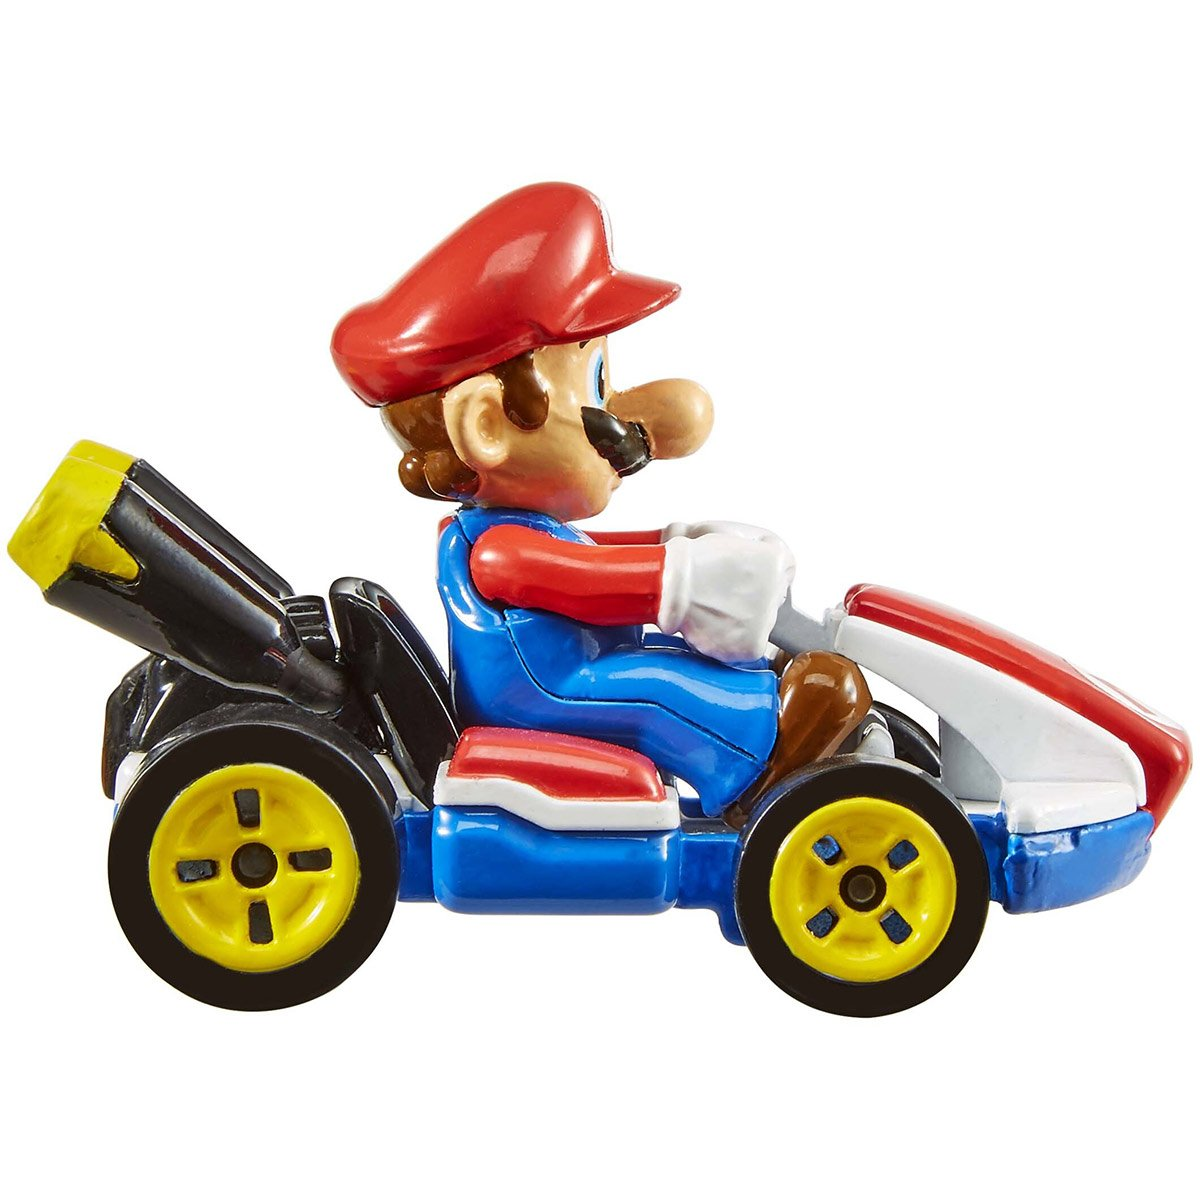 Dessin Personnage Mario En Couleur